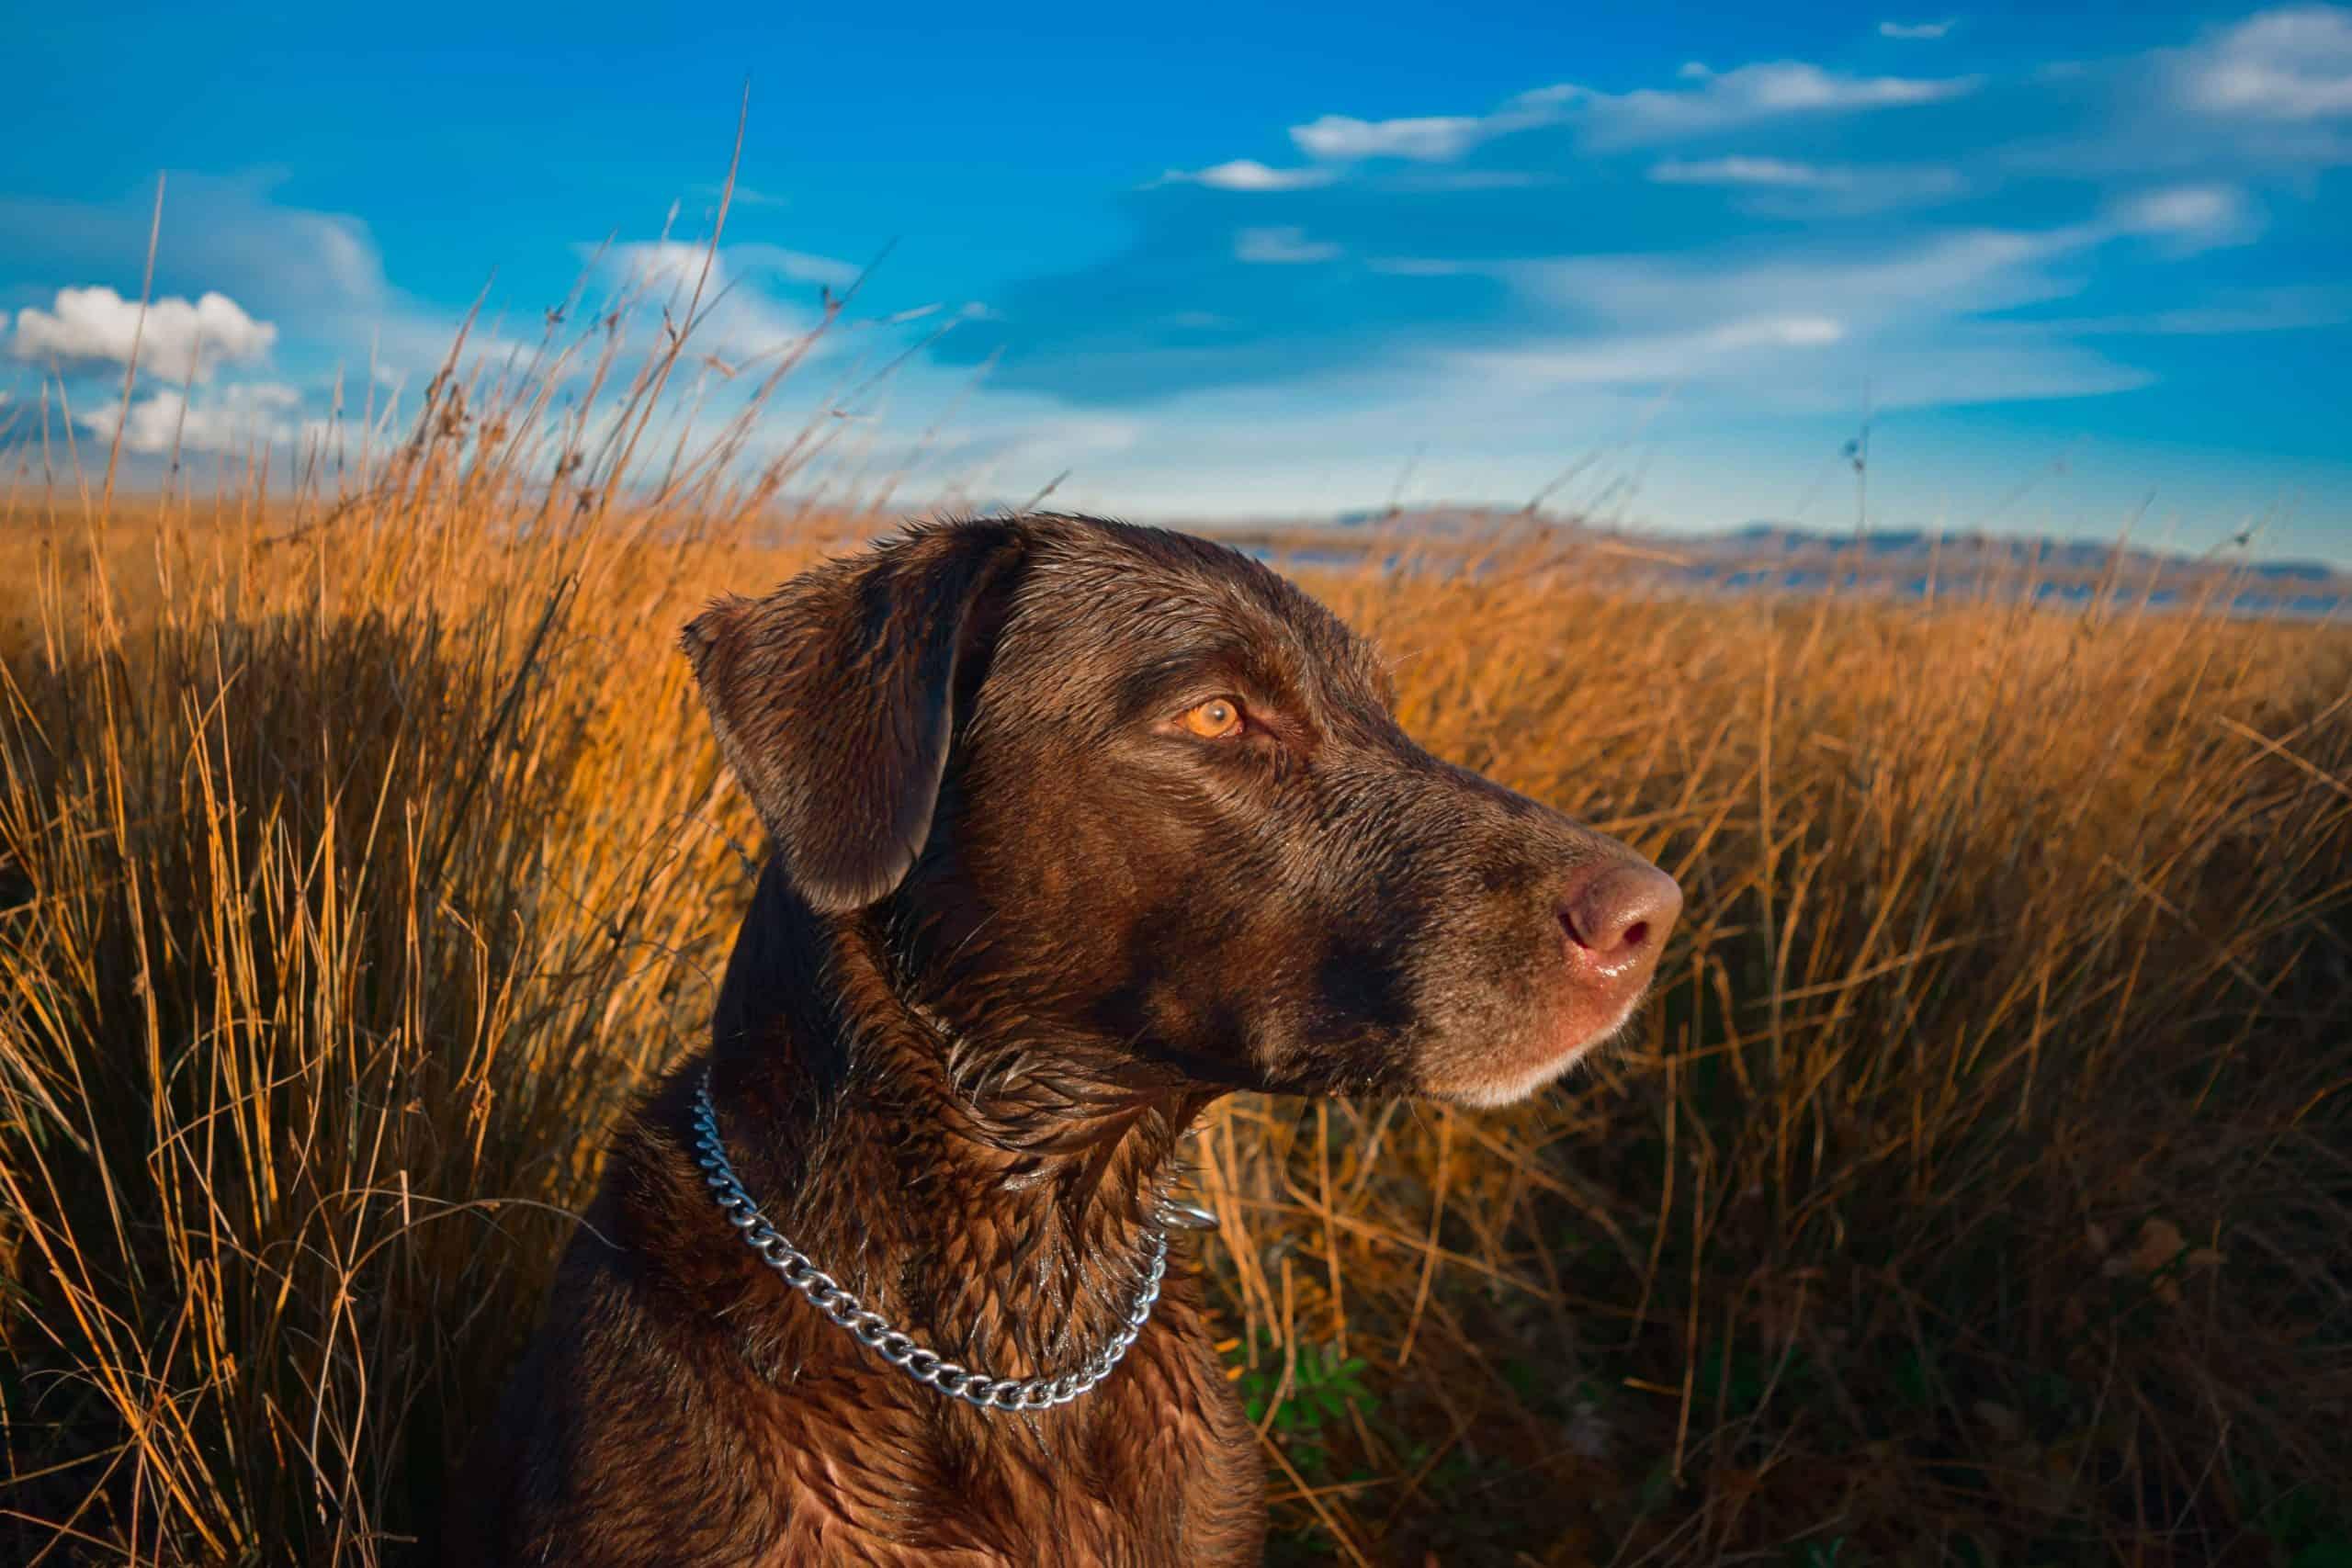 Labrador Retriever in the field.